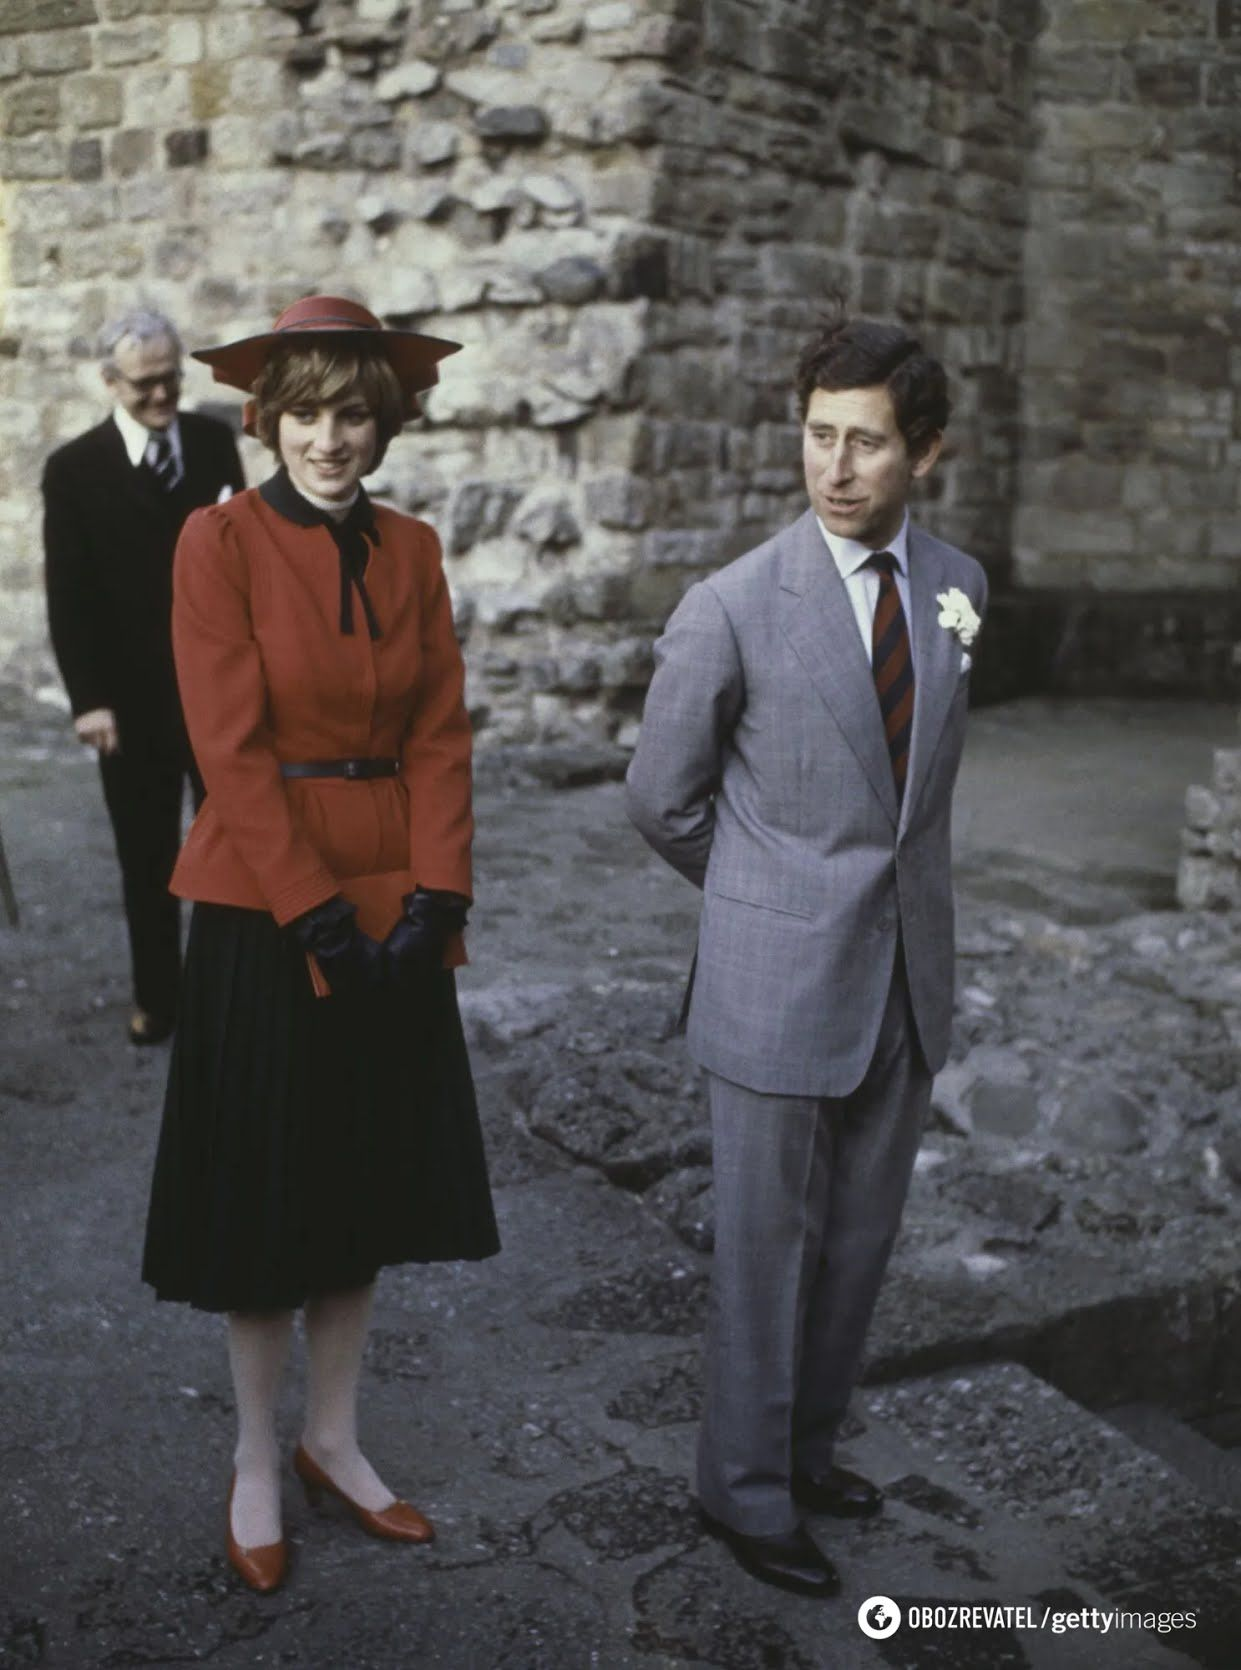 Королівська пара на публіці